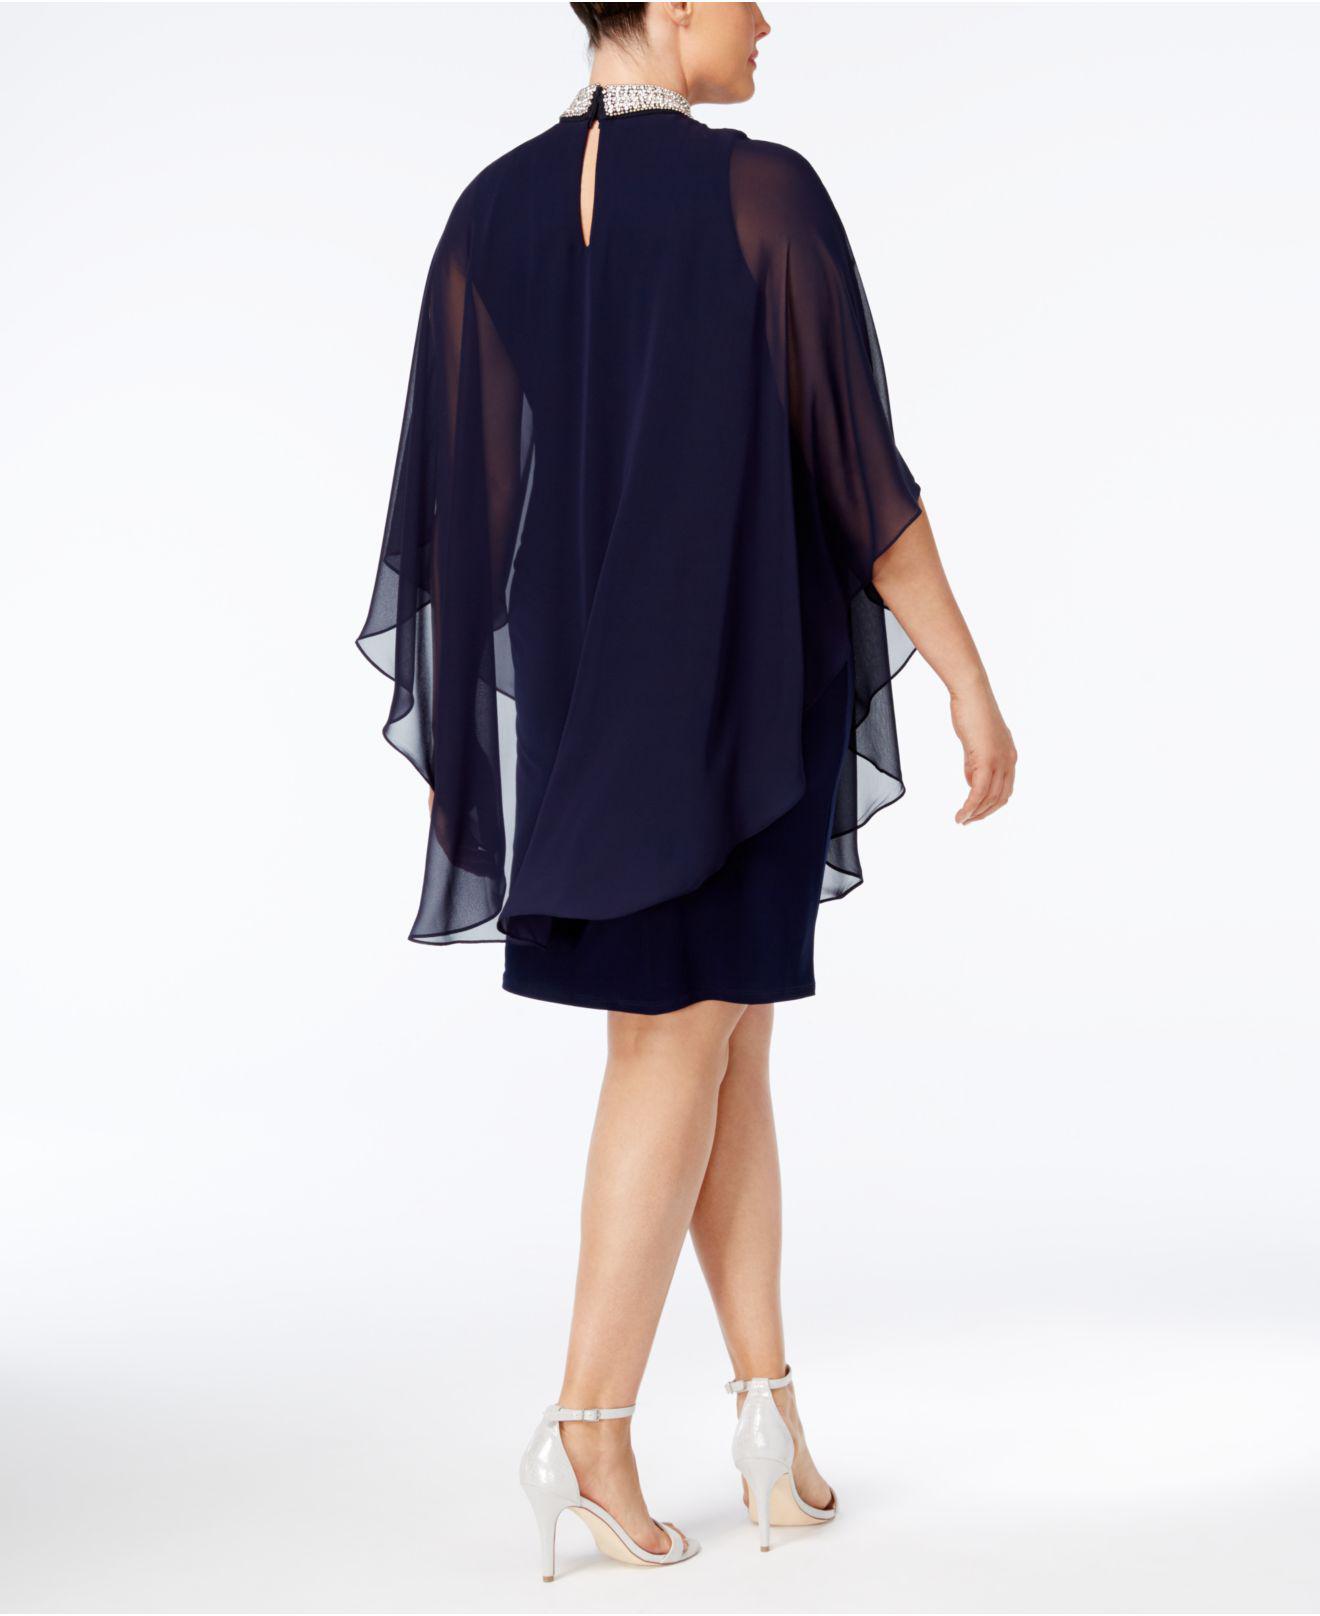 c87aa6424ef Lyst - Xscape Plus Size Embellished Chiffon-overlay Sheath Dress in Blue